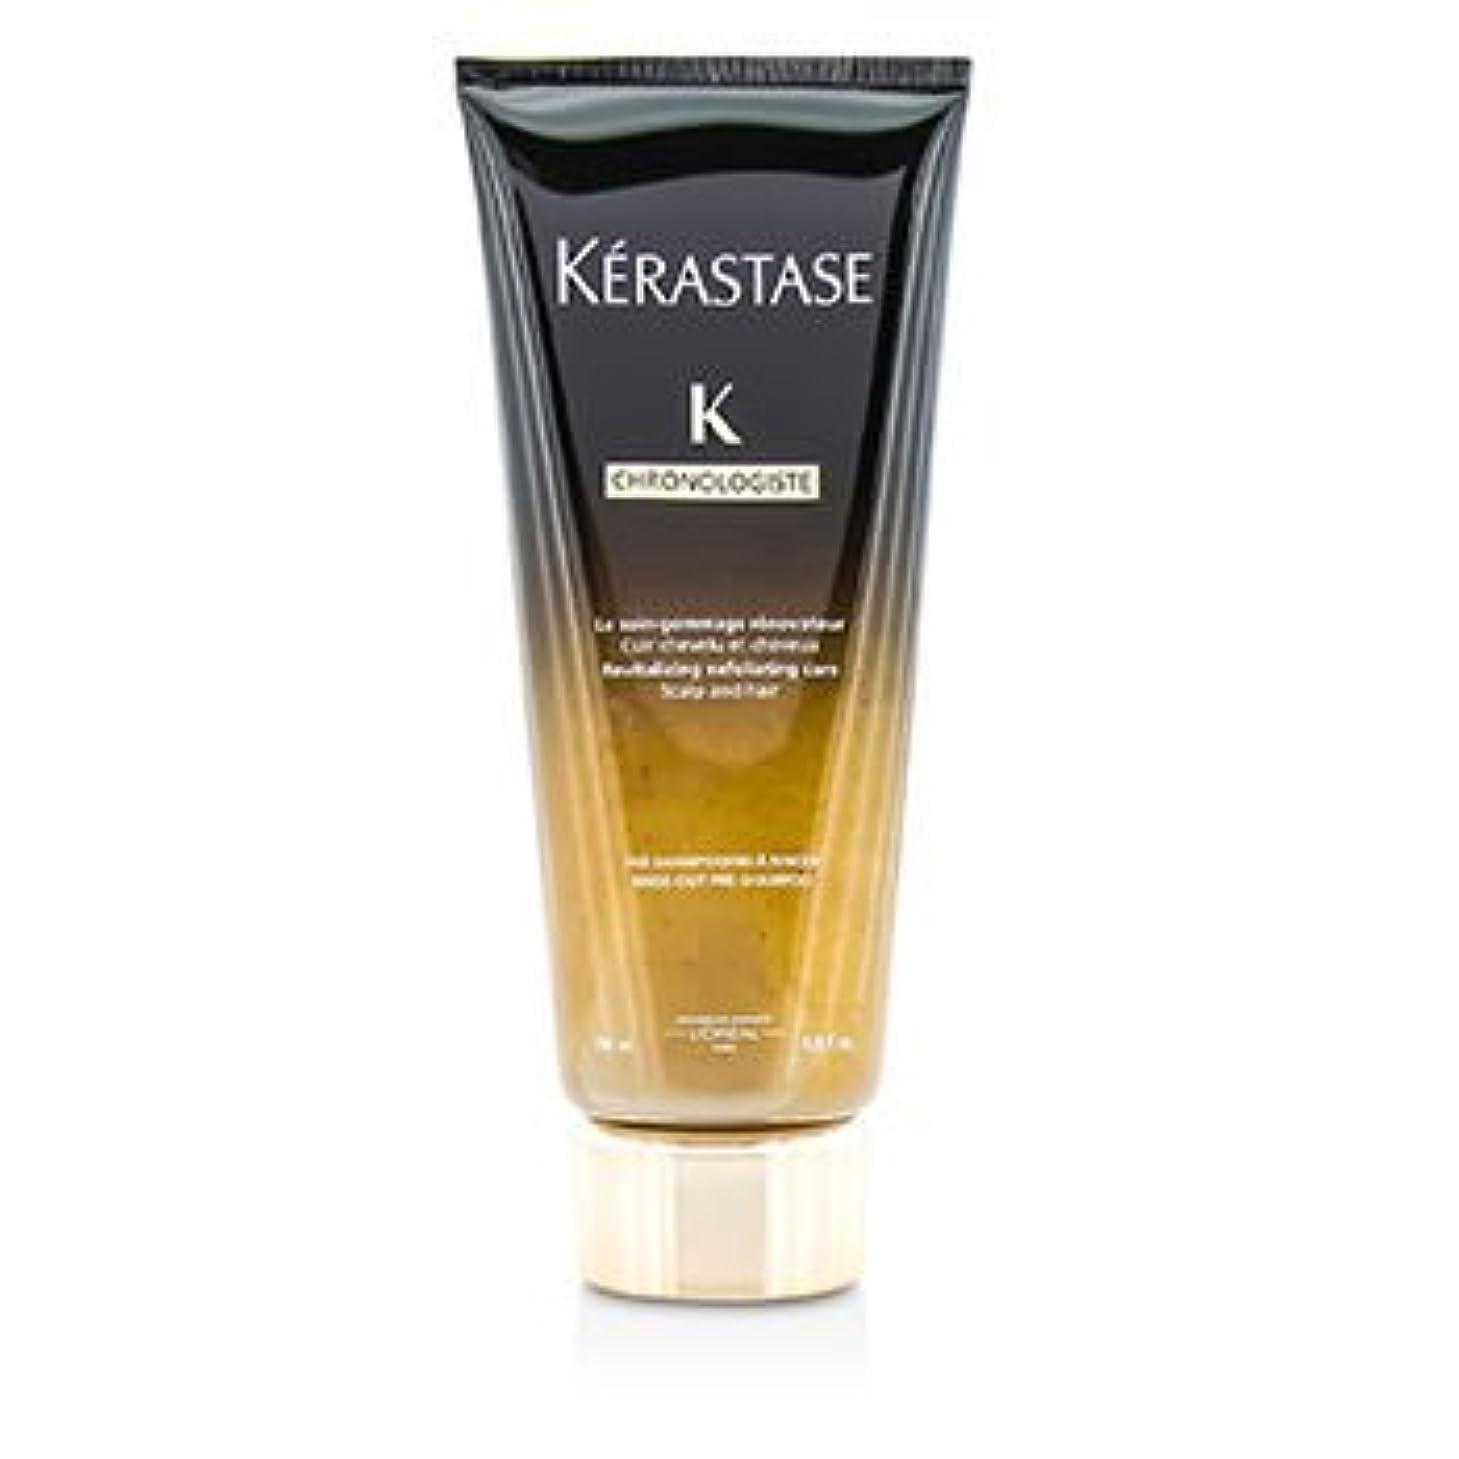 今黙九時四十五分[Kerastase] Chronolgiste Revitalizing Exfoliating Care - Scalp and Hair (Rinse-Out Pre-Shampoo) 200ml/6.8oz